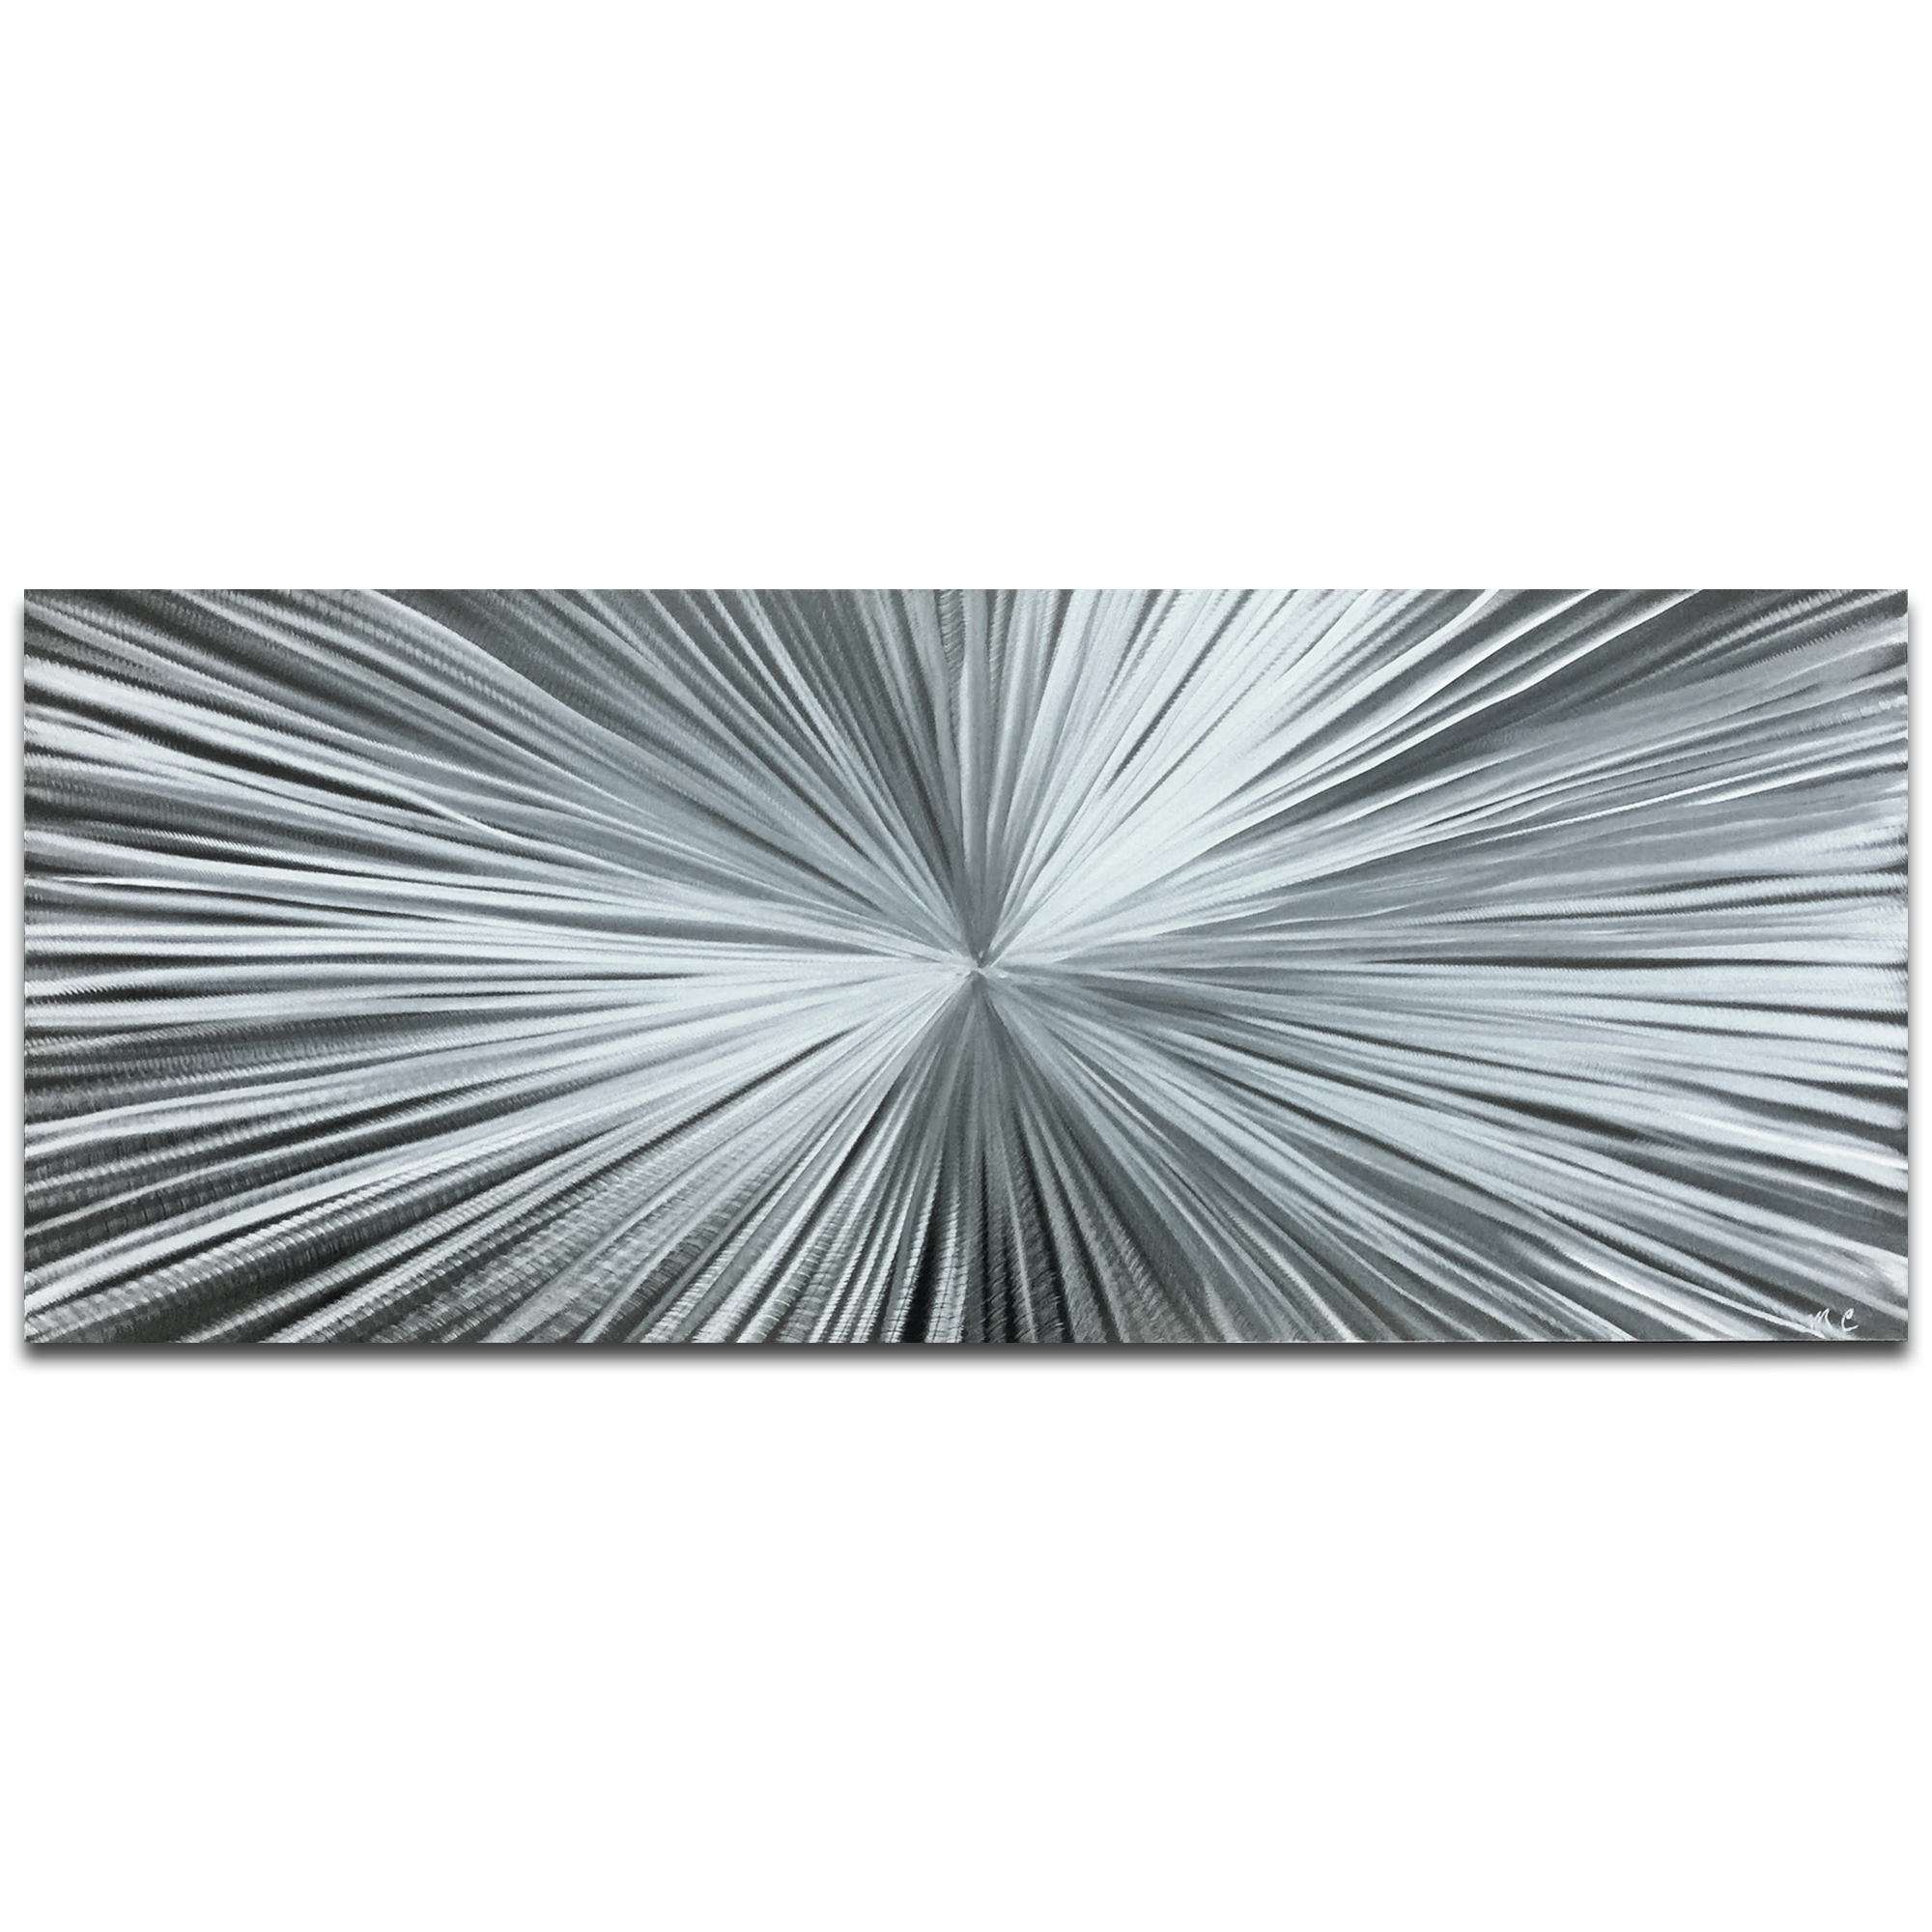 Helena Martin 'Starburst Silver' 60in x 24in Original Abstract Art on Ground Metal